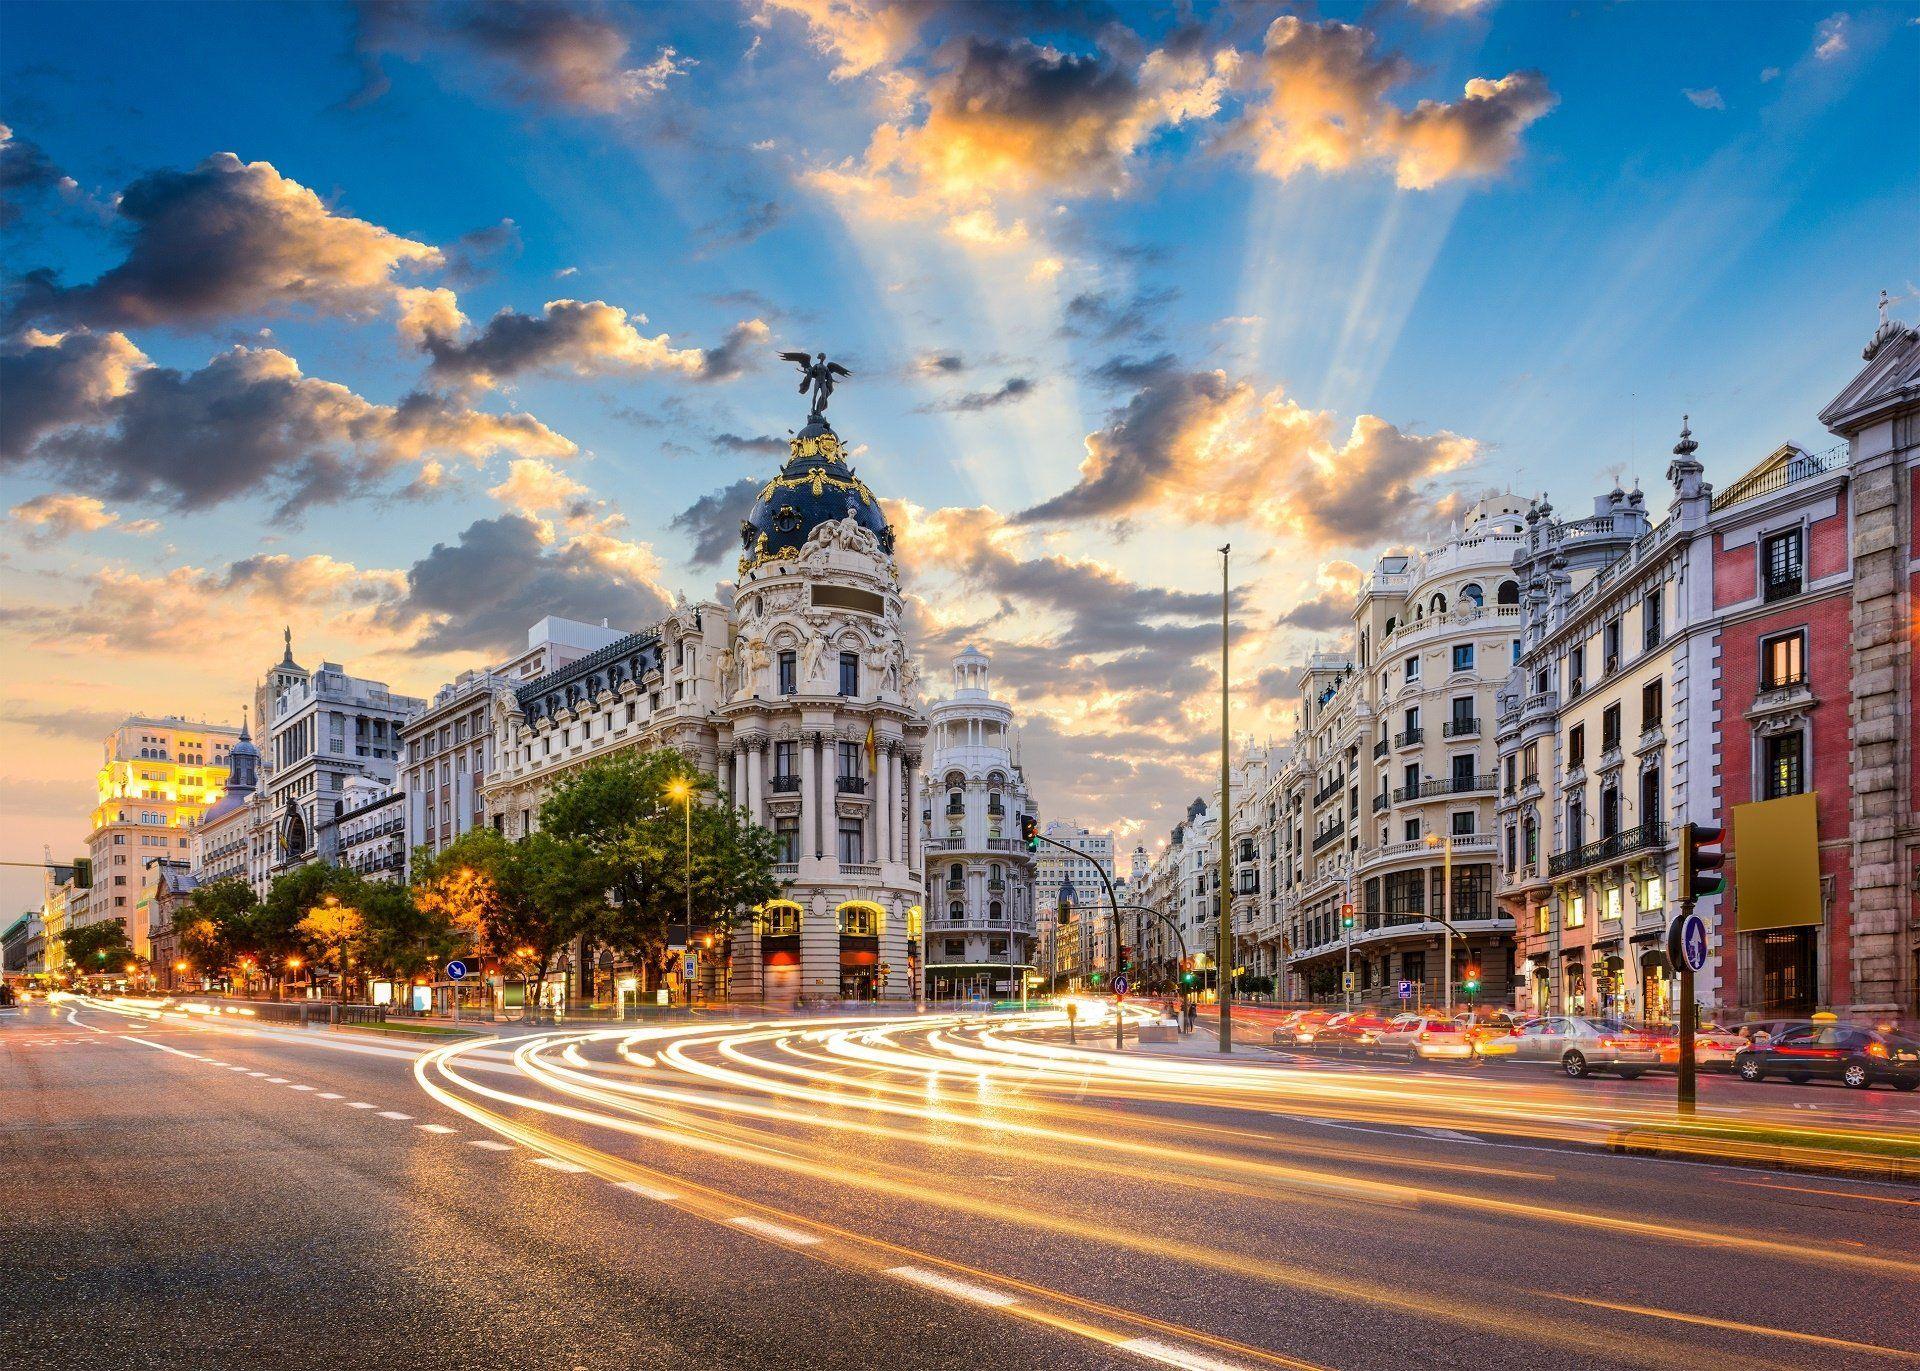 MADRID-ANDALOUSIE REVEILLON 2022